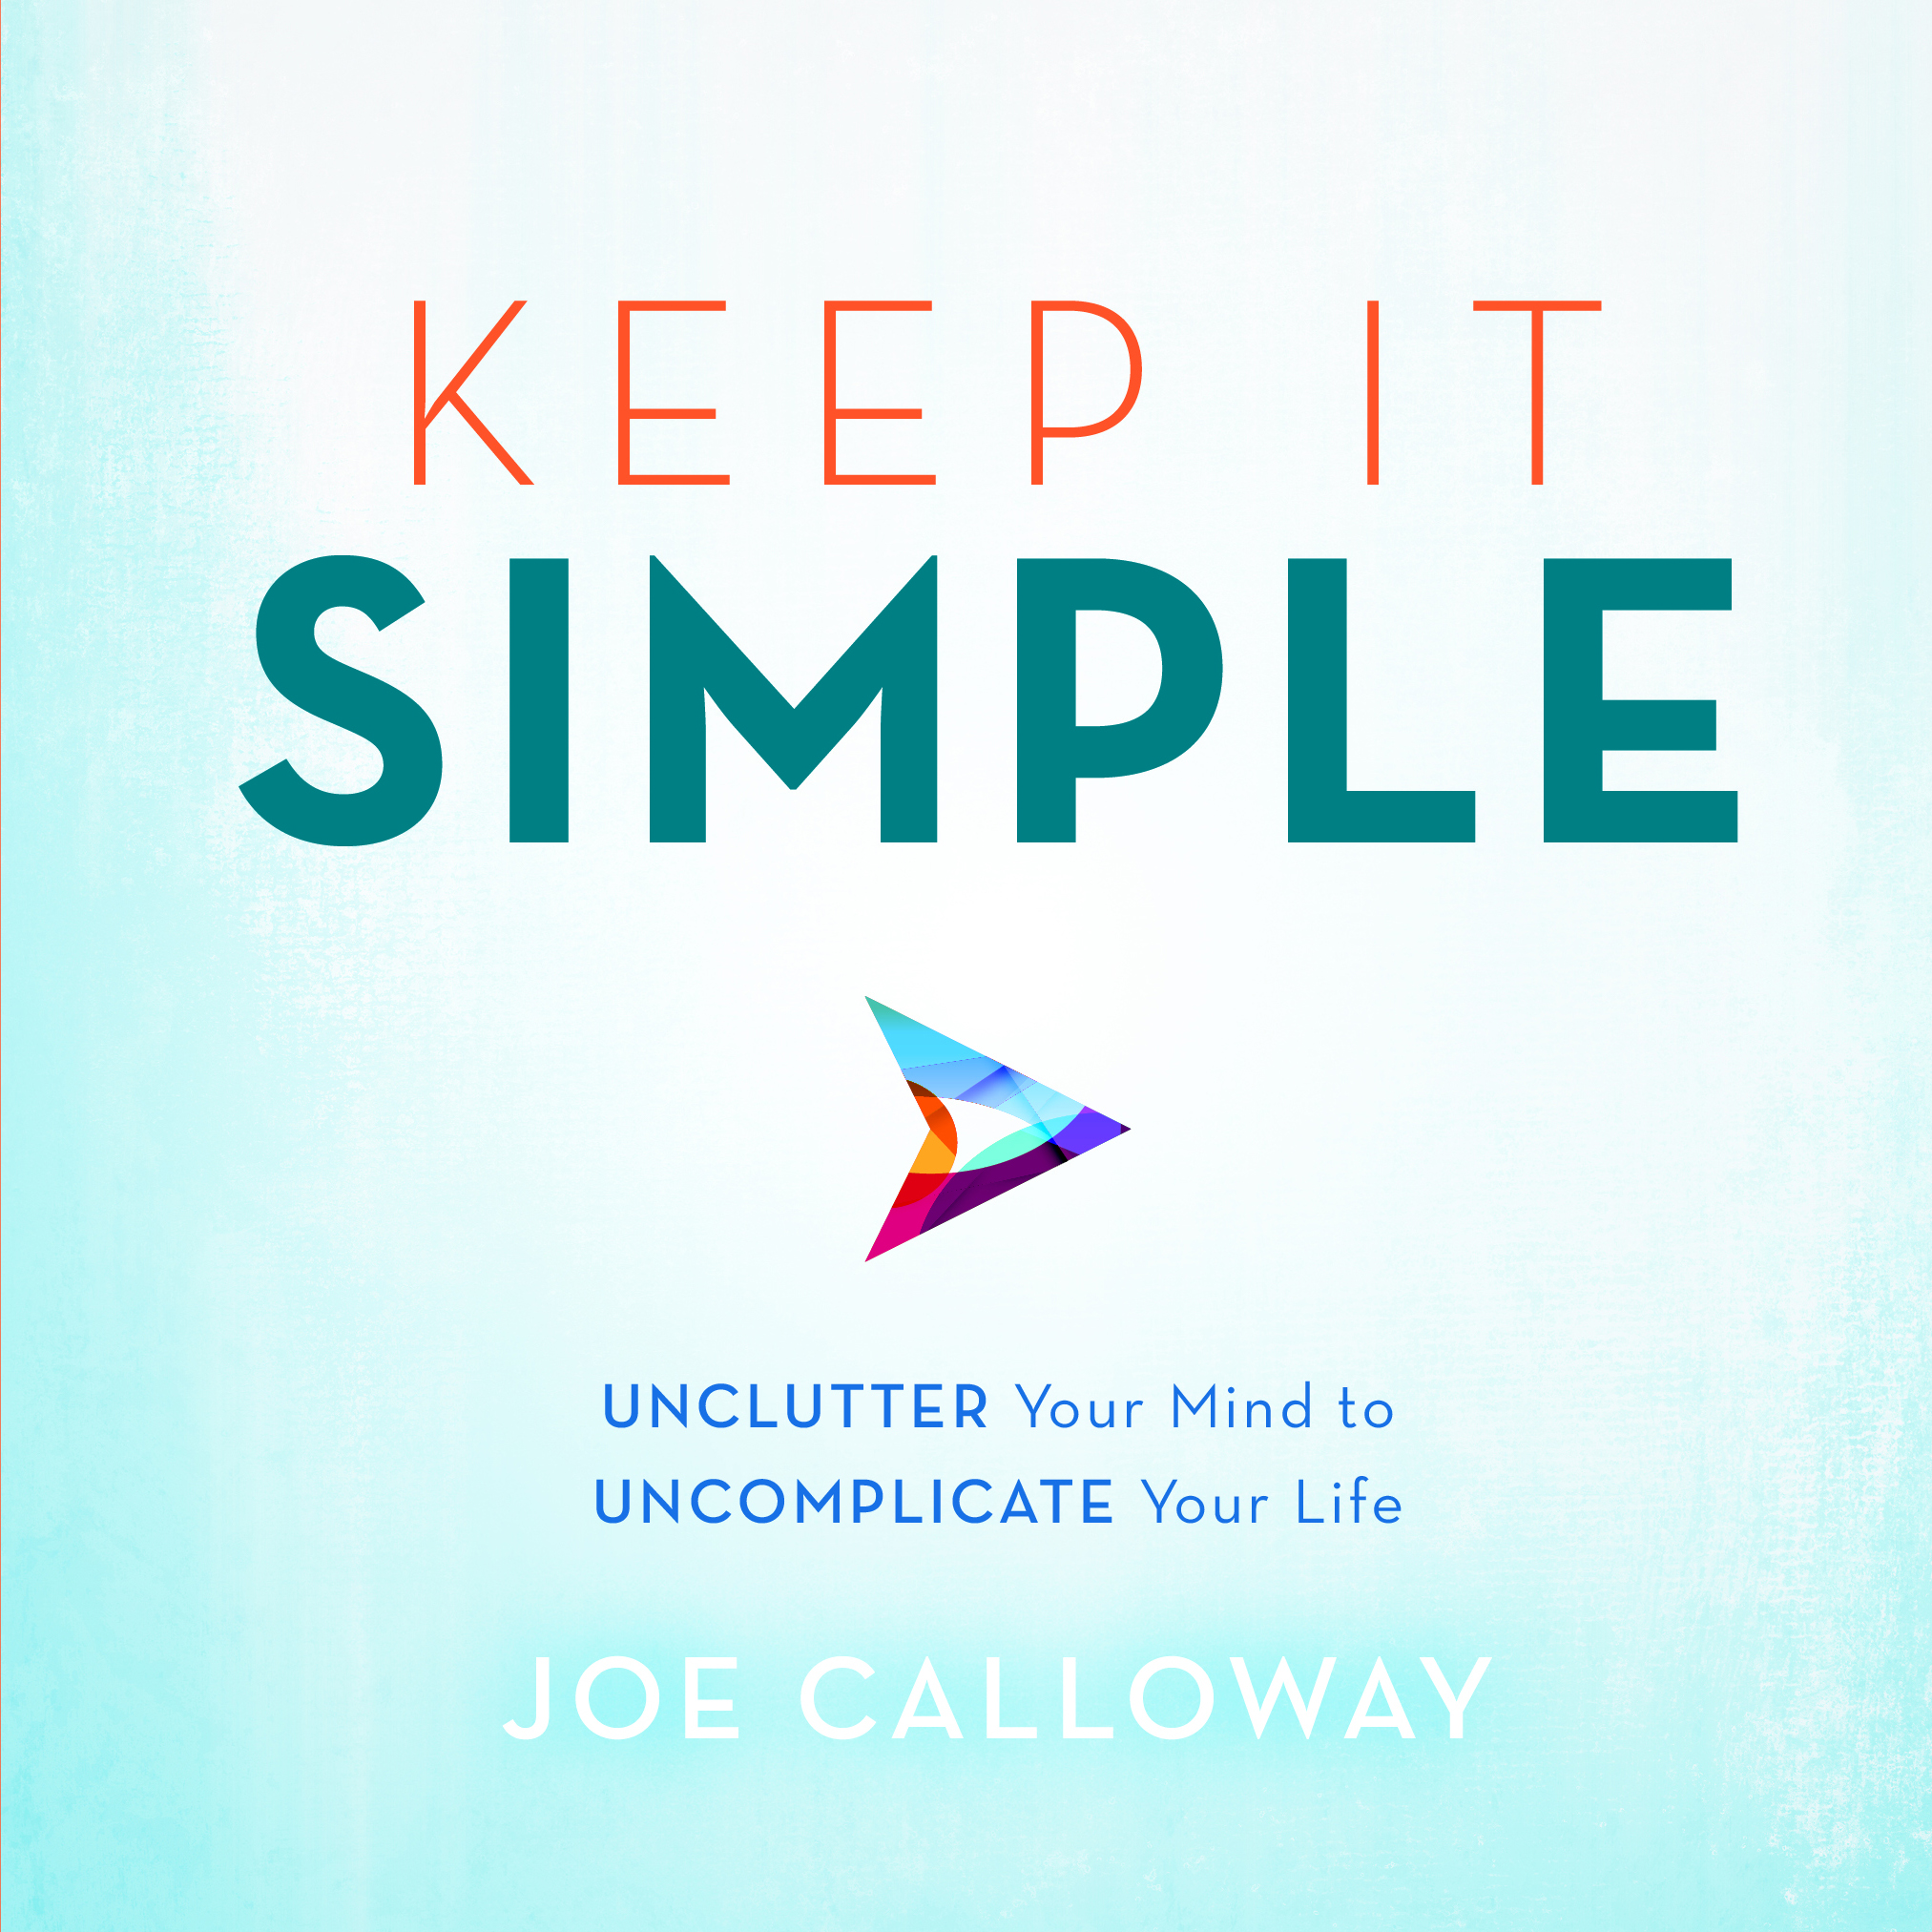 Keep-it-Simple-039-Calloway-Joe